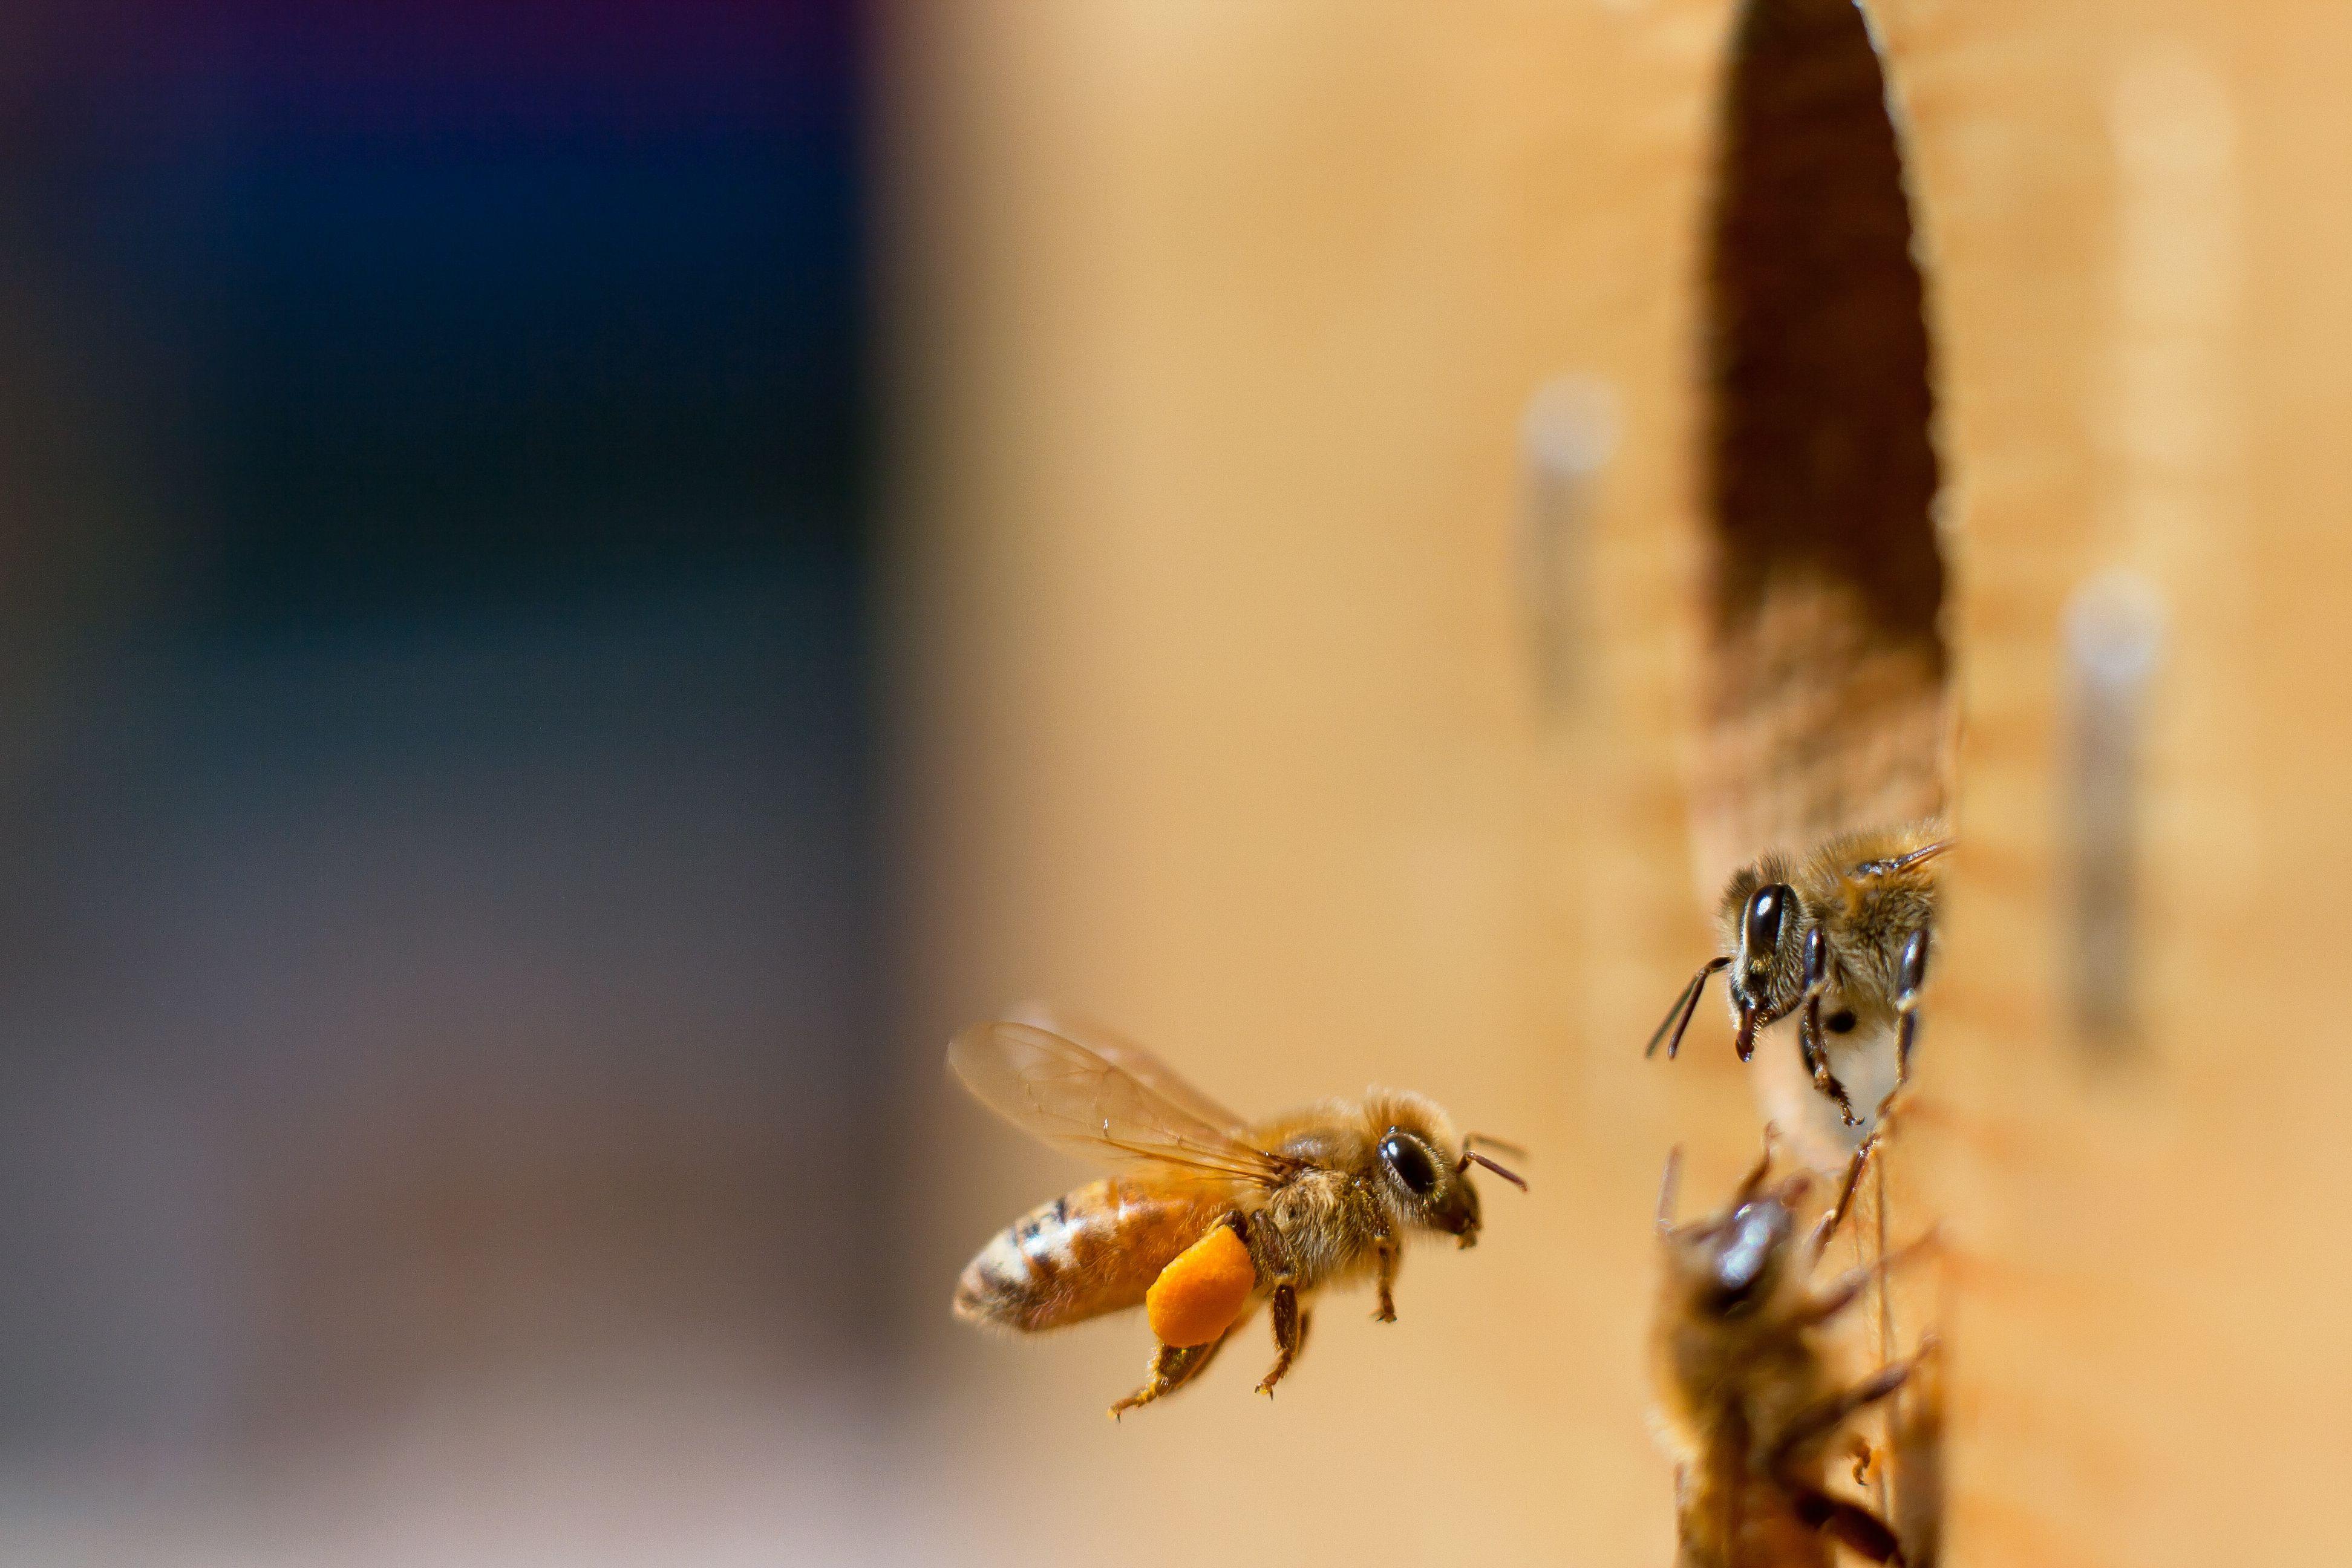 American Honeybees Just Can't Get a Break